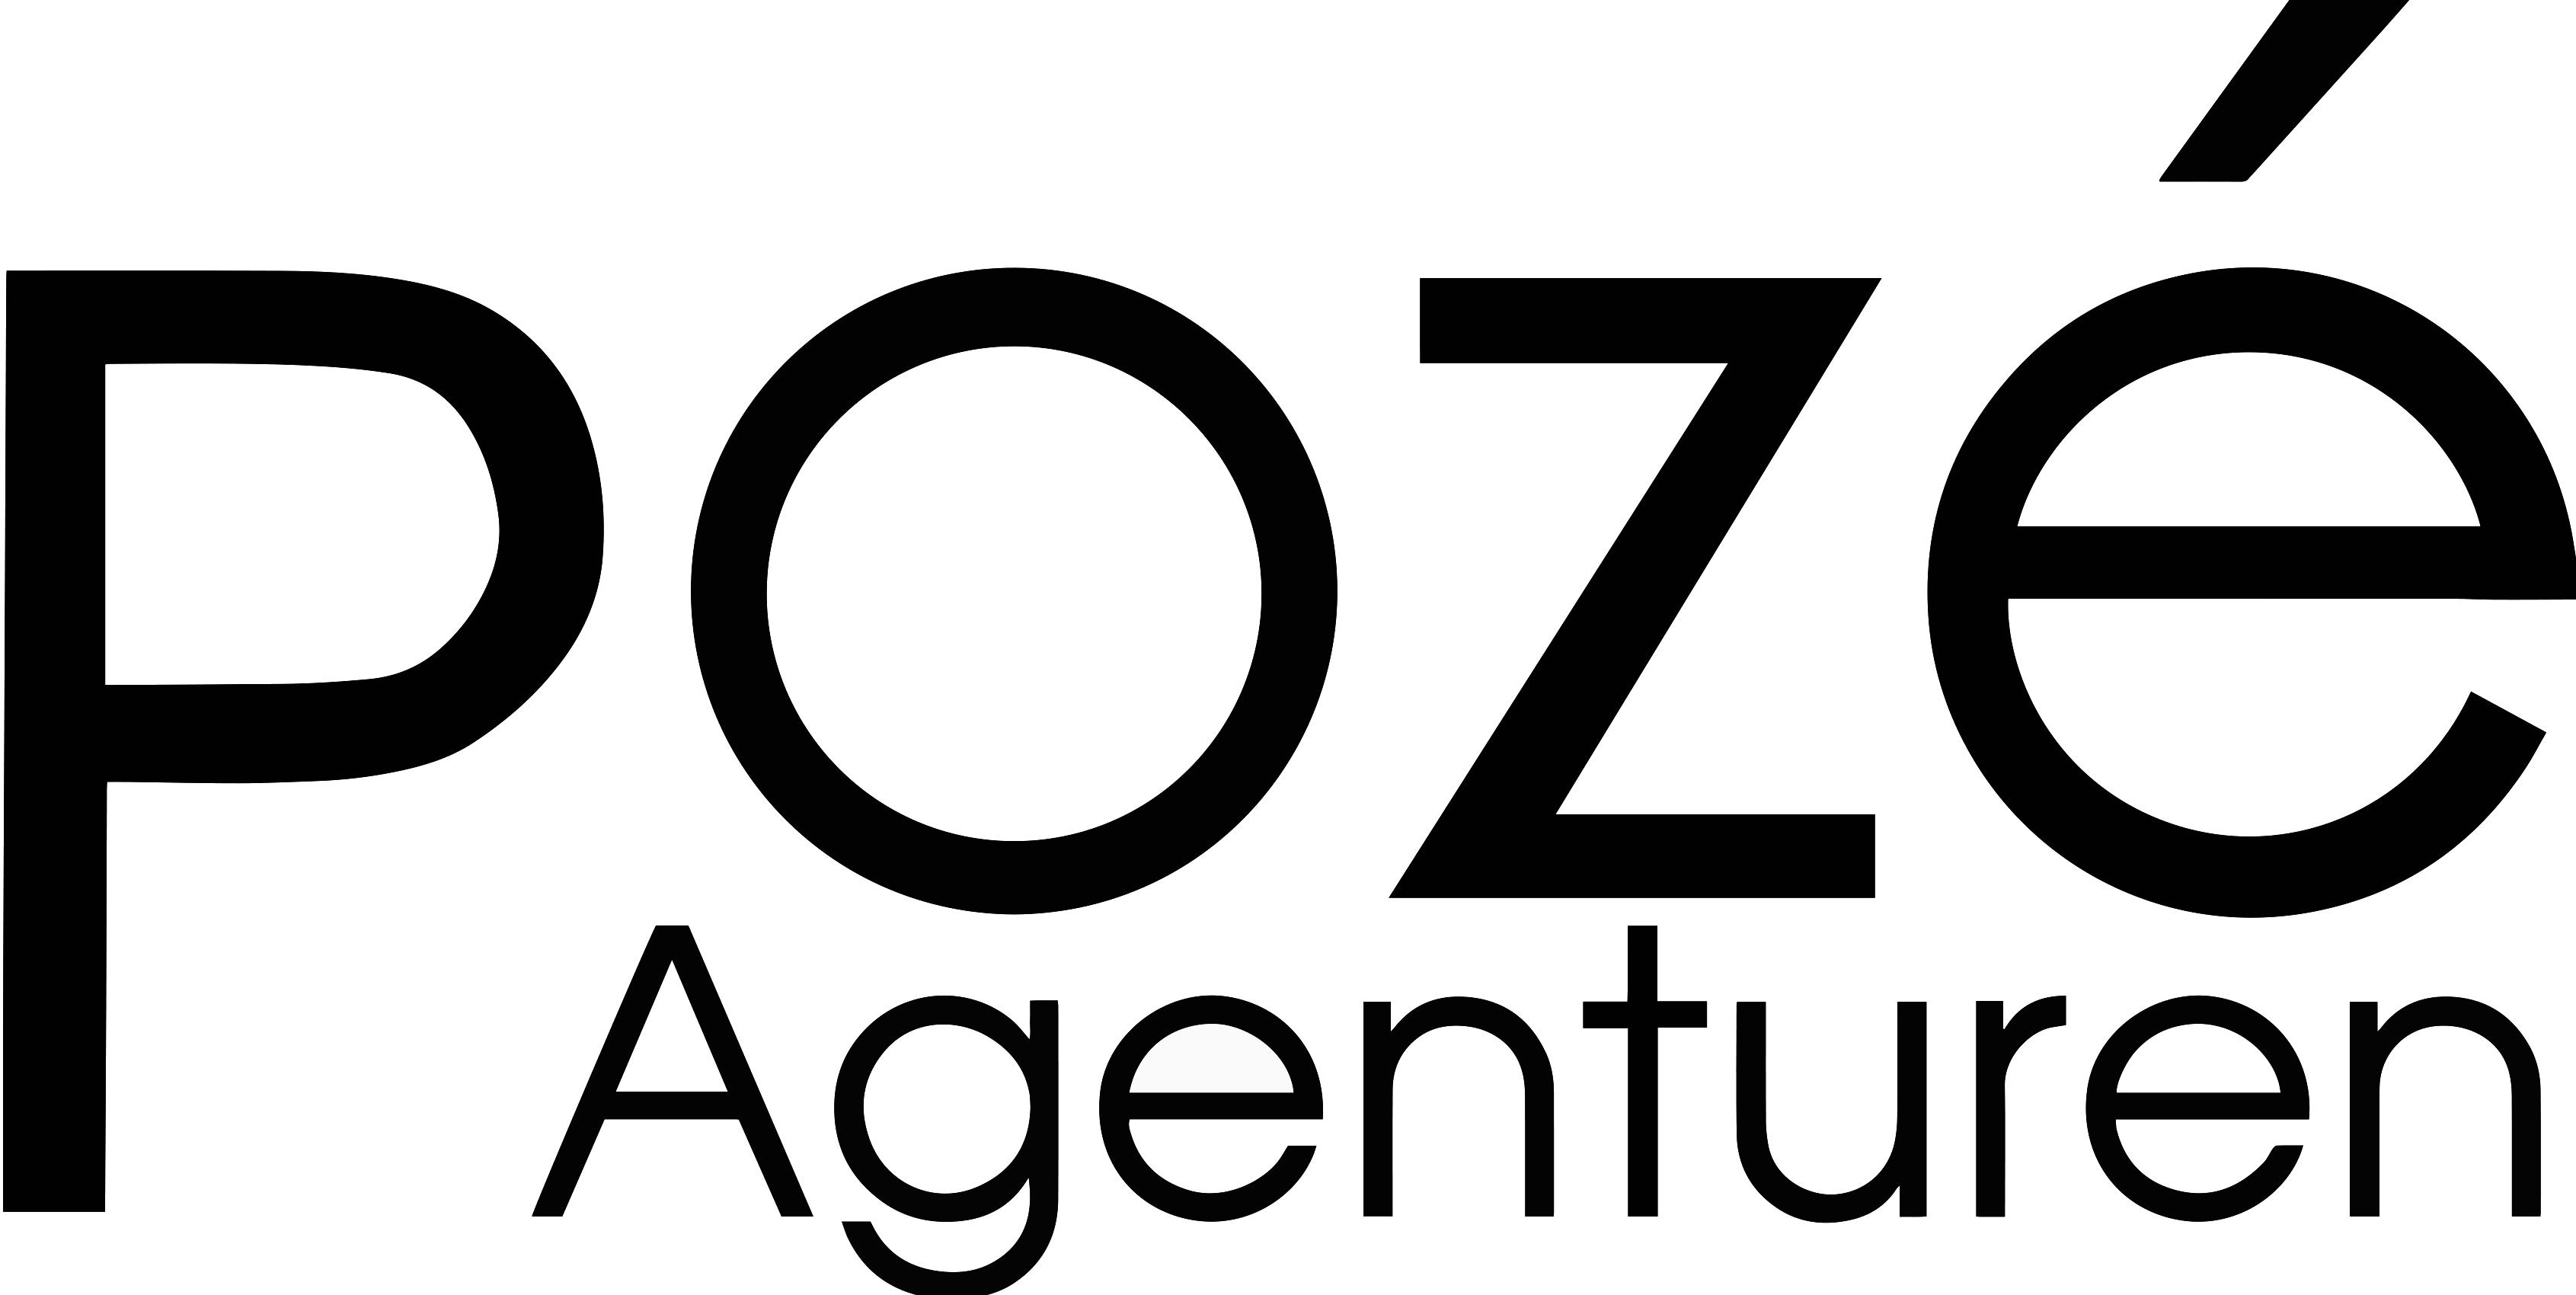 Pozé Agenturen